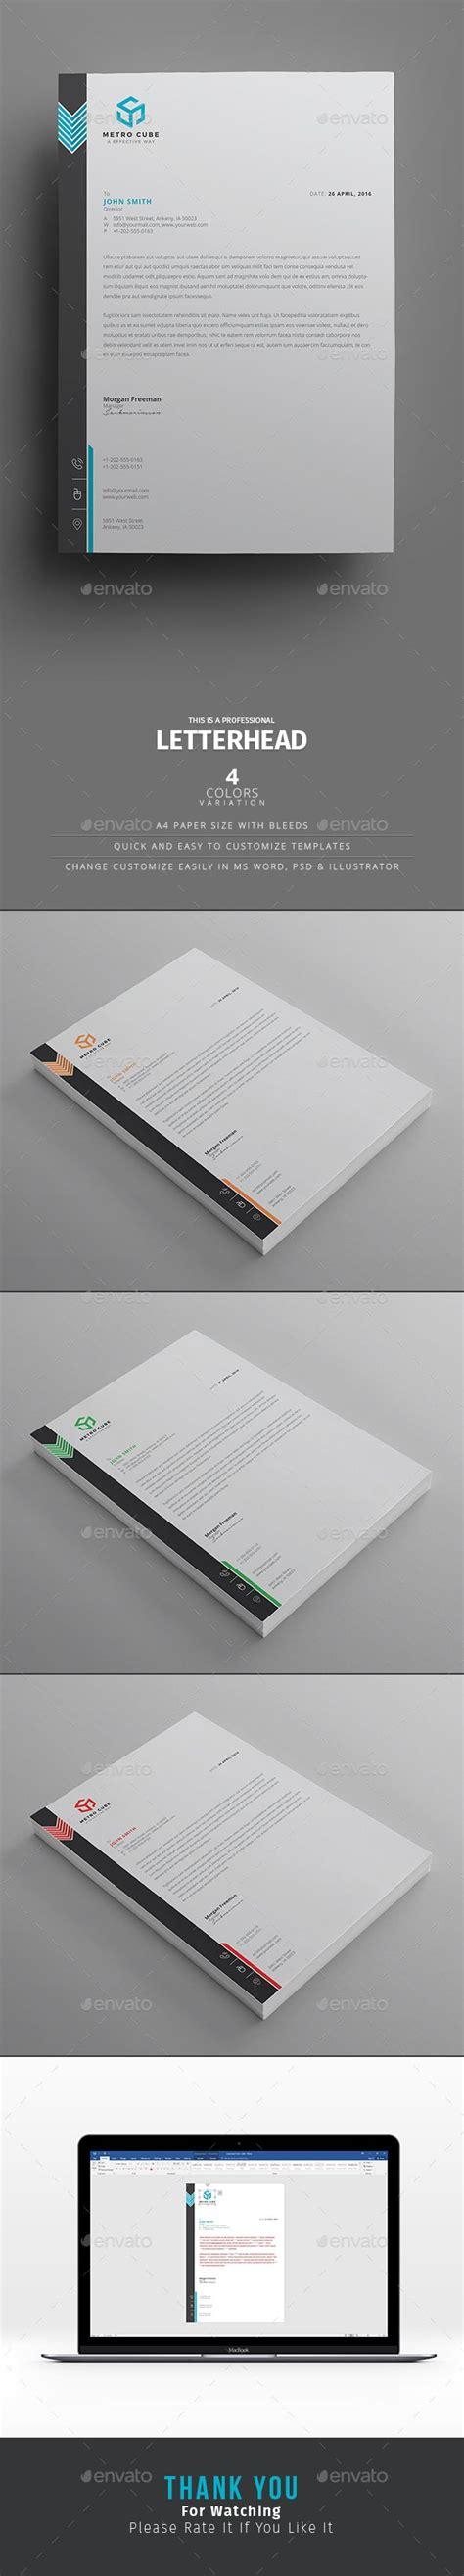 business letterhead design inspiration best 20 letterhead design ideas on